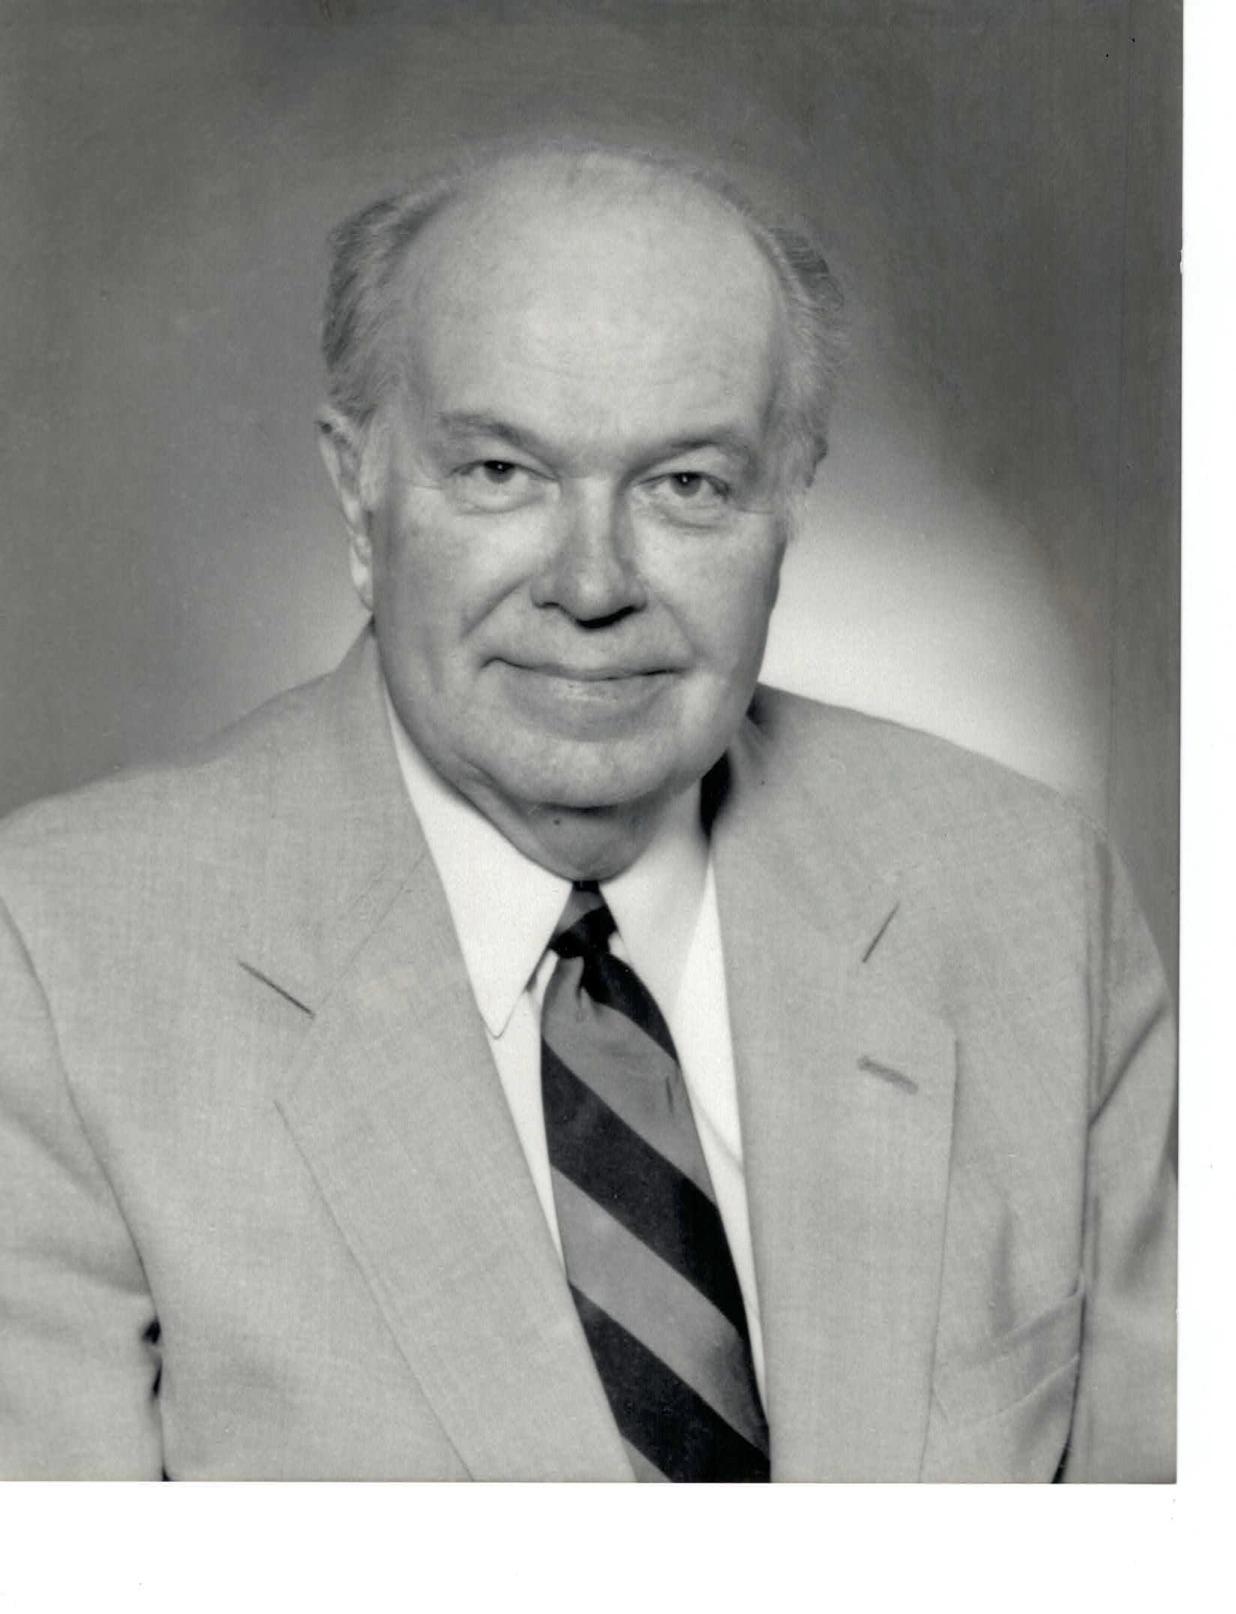 STANLEY R. GALLUP 1996-97